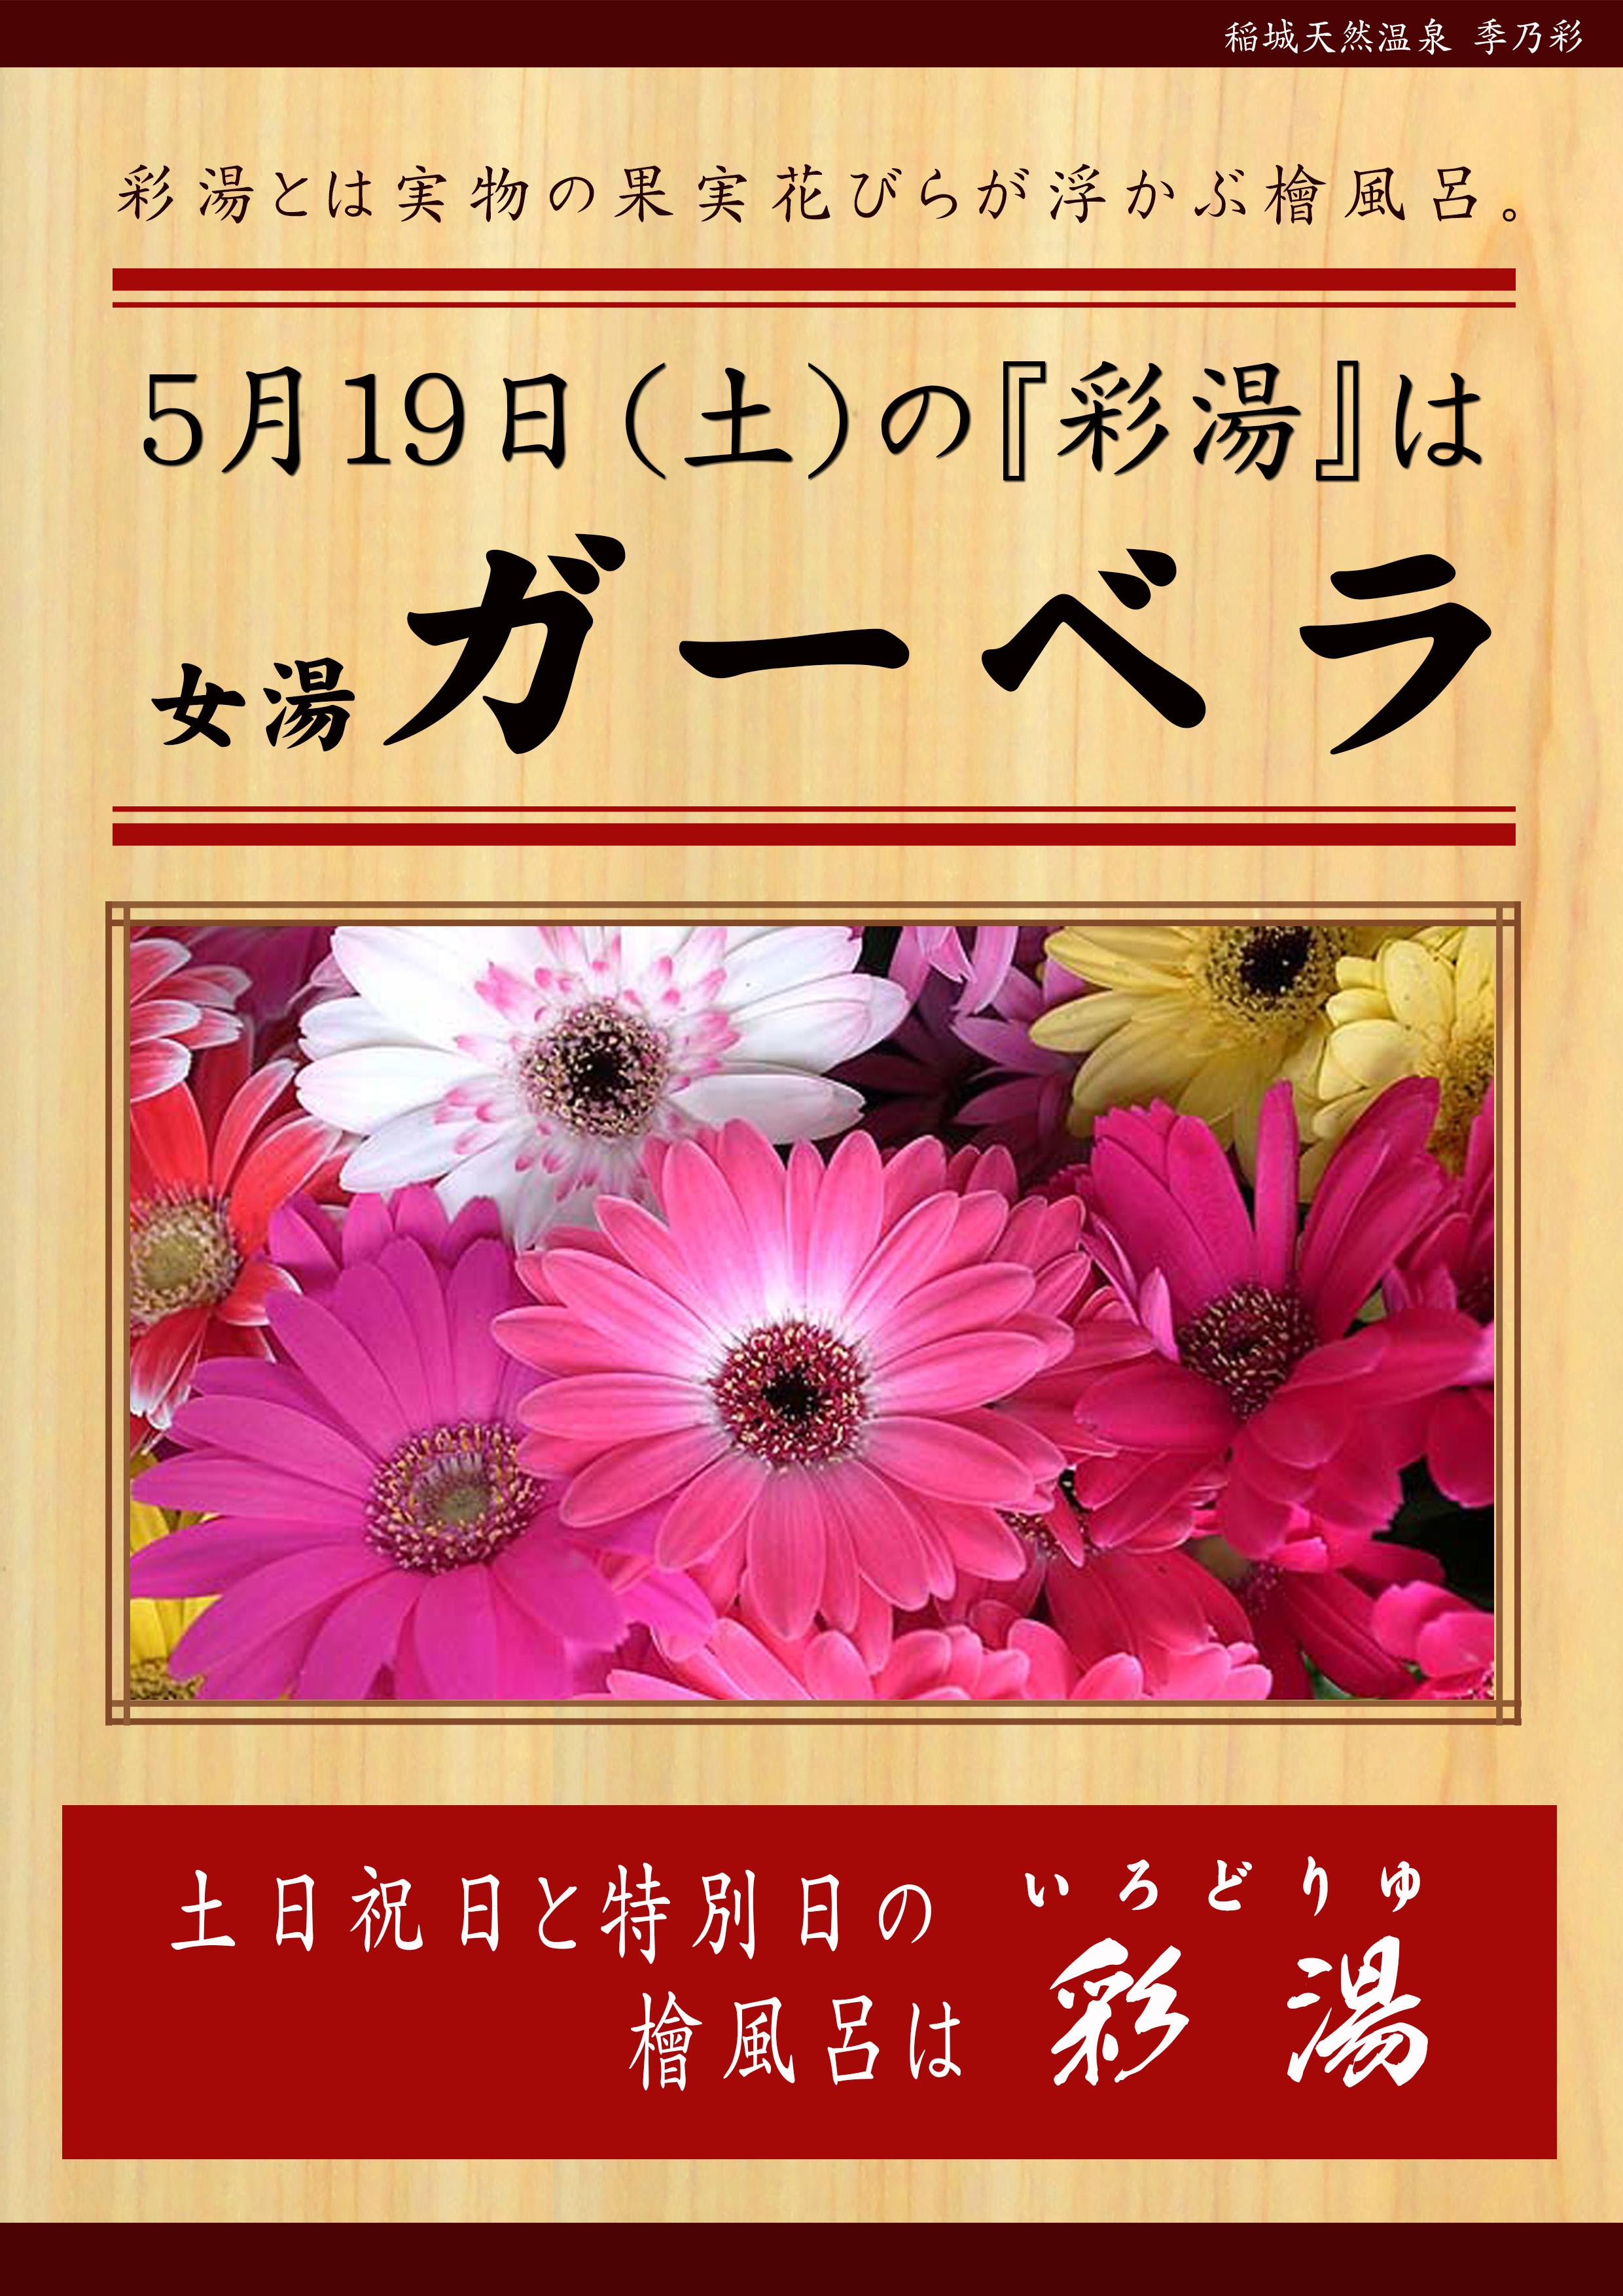 20180519POP イベント 彩湯 女湯 ガーベラ